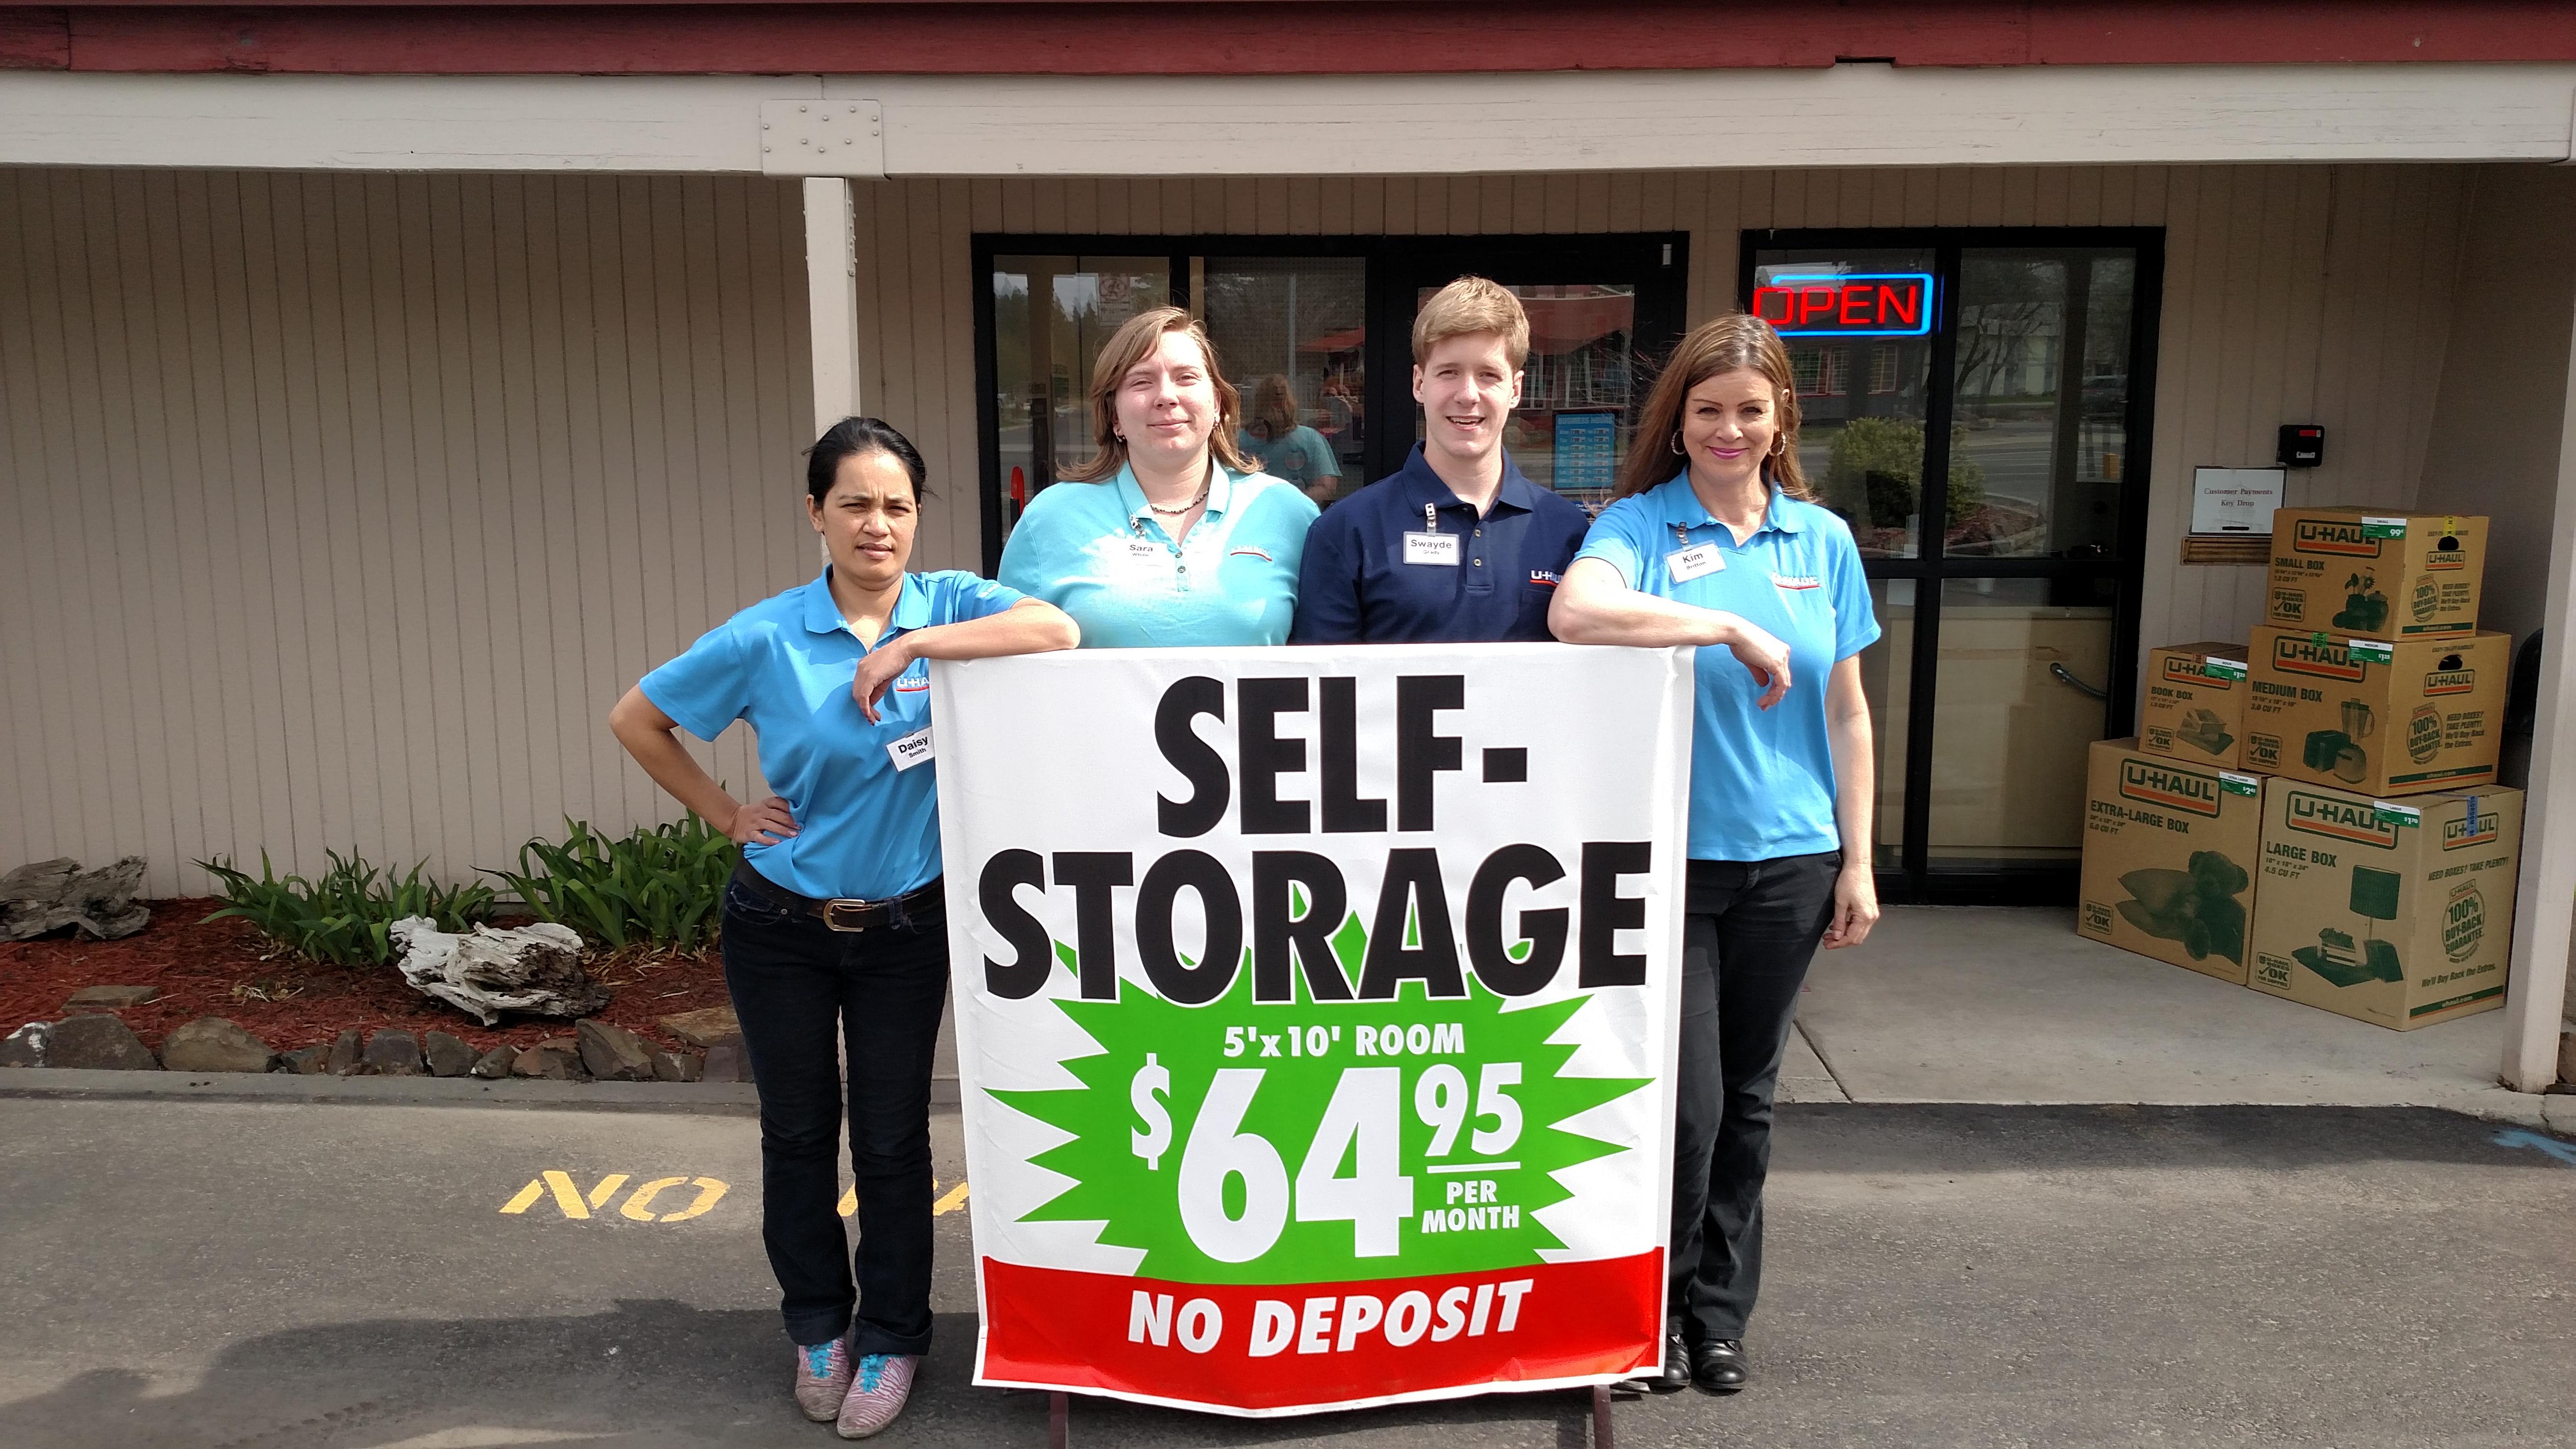 U Haul Moving & Storage of Lidgerwood Spokane WA